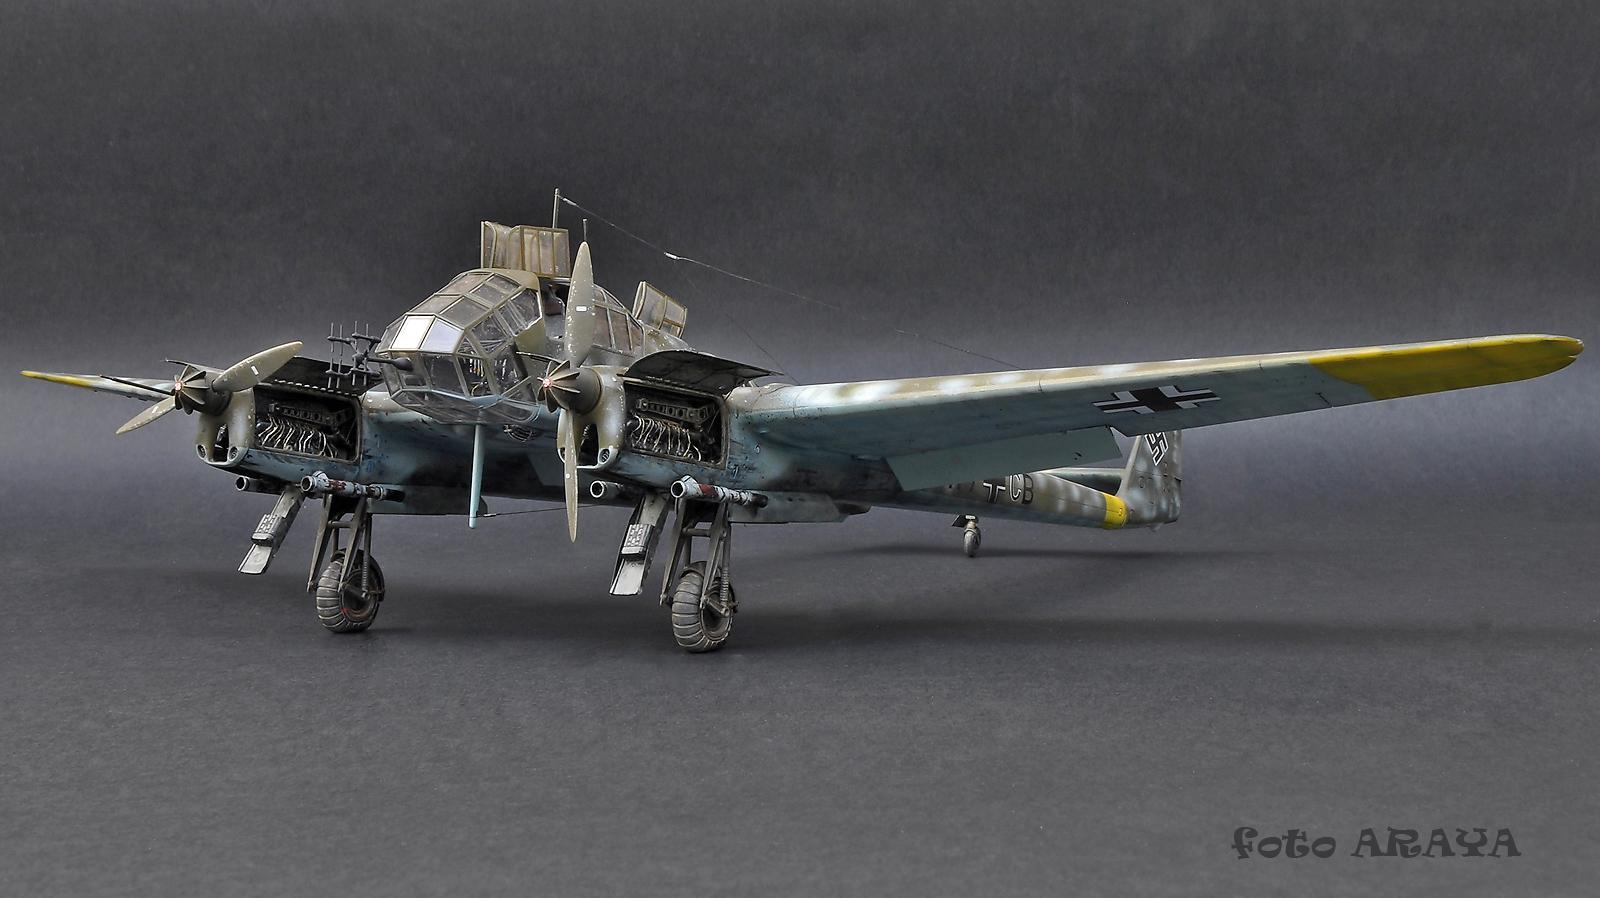 Fw 189A-1 Nachtjäger, Great Wall Hobby, 1/48